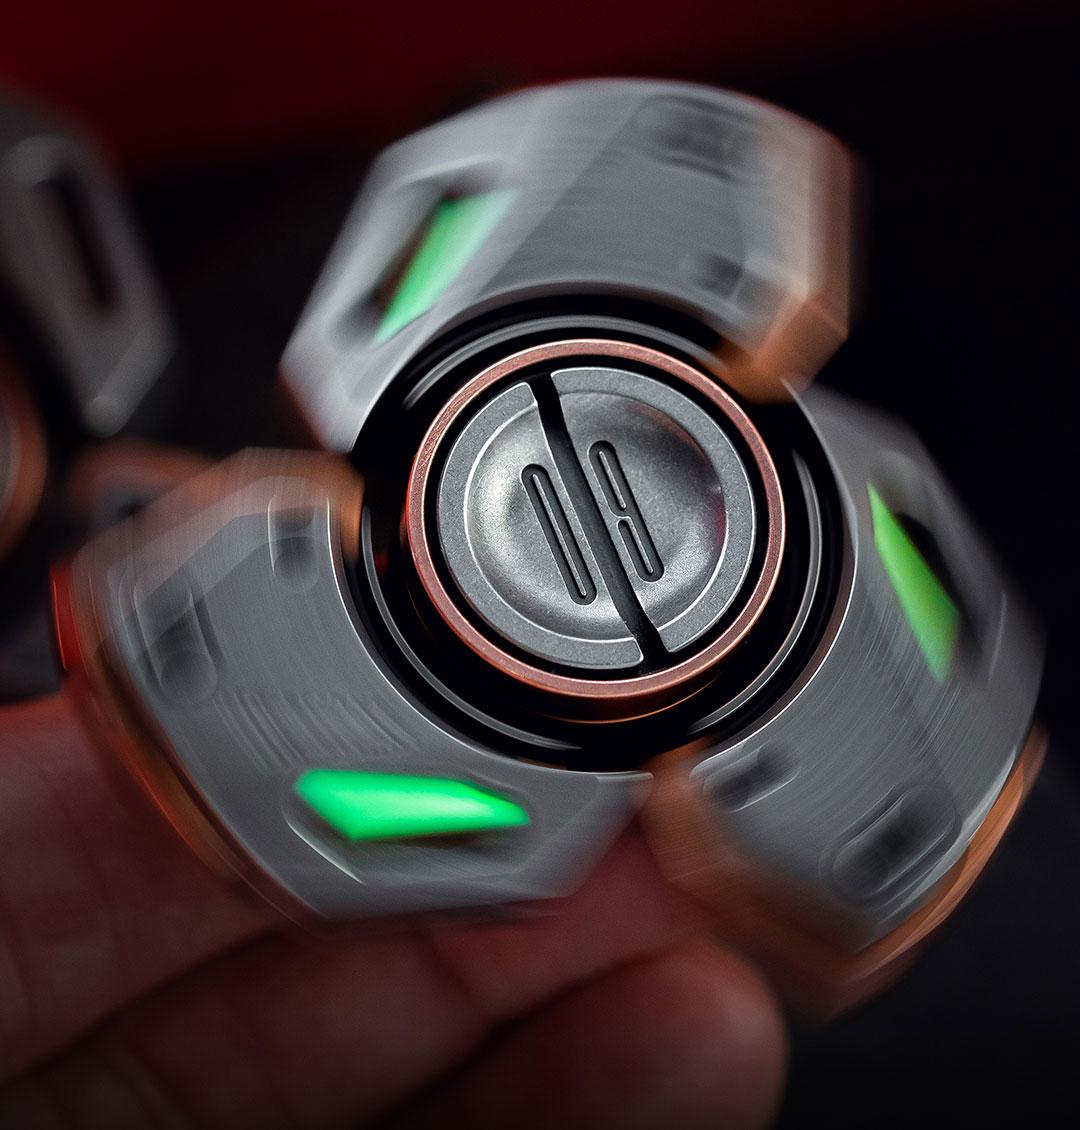 Original EDC Gyro Bit-09 Fingertip Gyro Zirconium Alloy Brass Limited Edition Three-Leaf Fidget Spinner enlarge